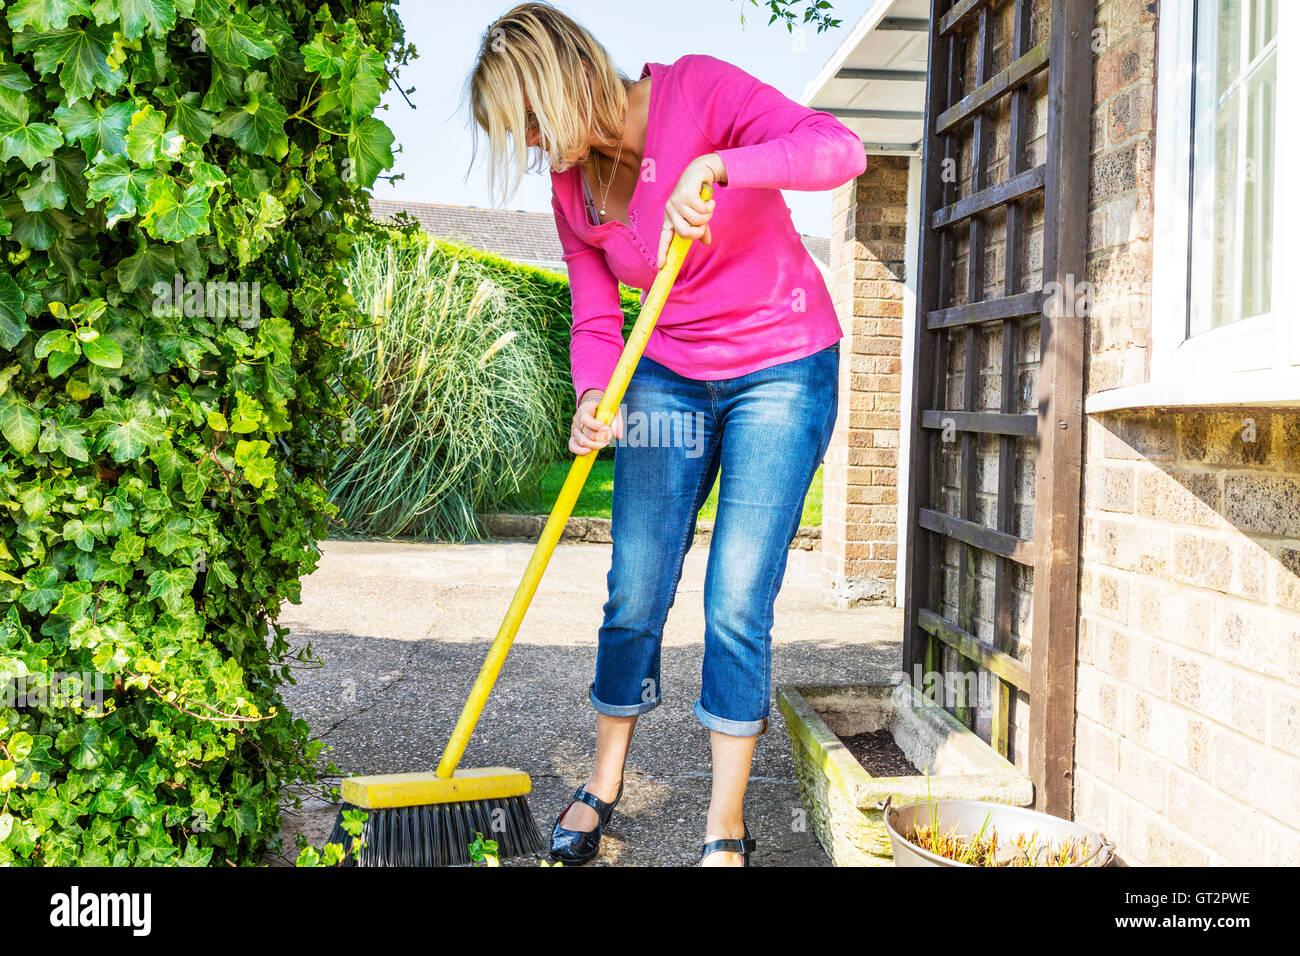 sweeping up mess broom brushing sweep gardening gardener hedge cuttings UK England GB clearing - Stock Image